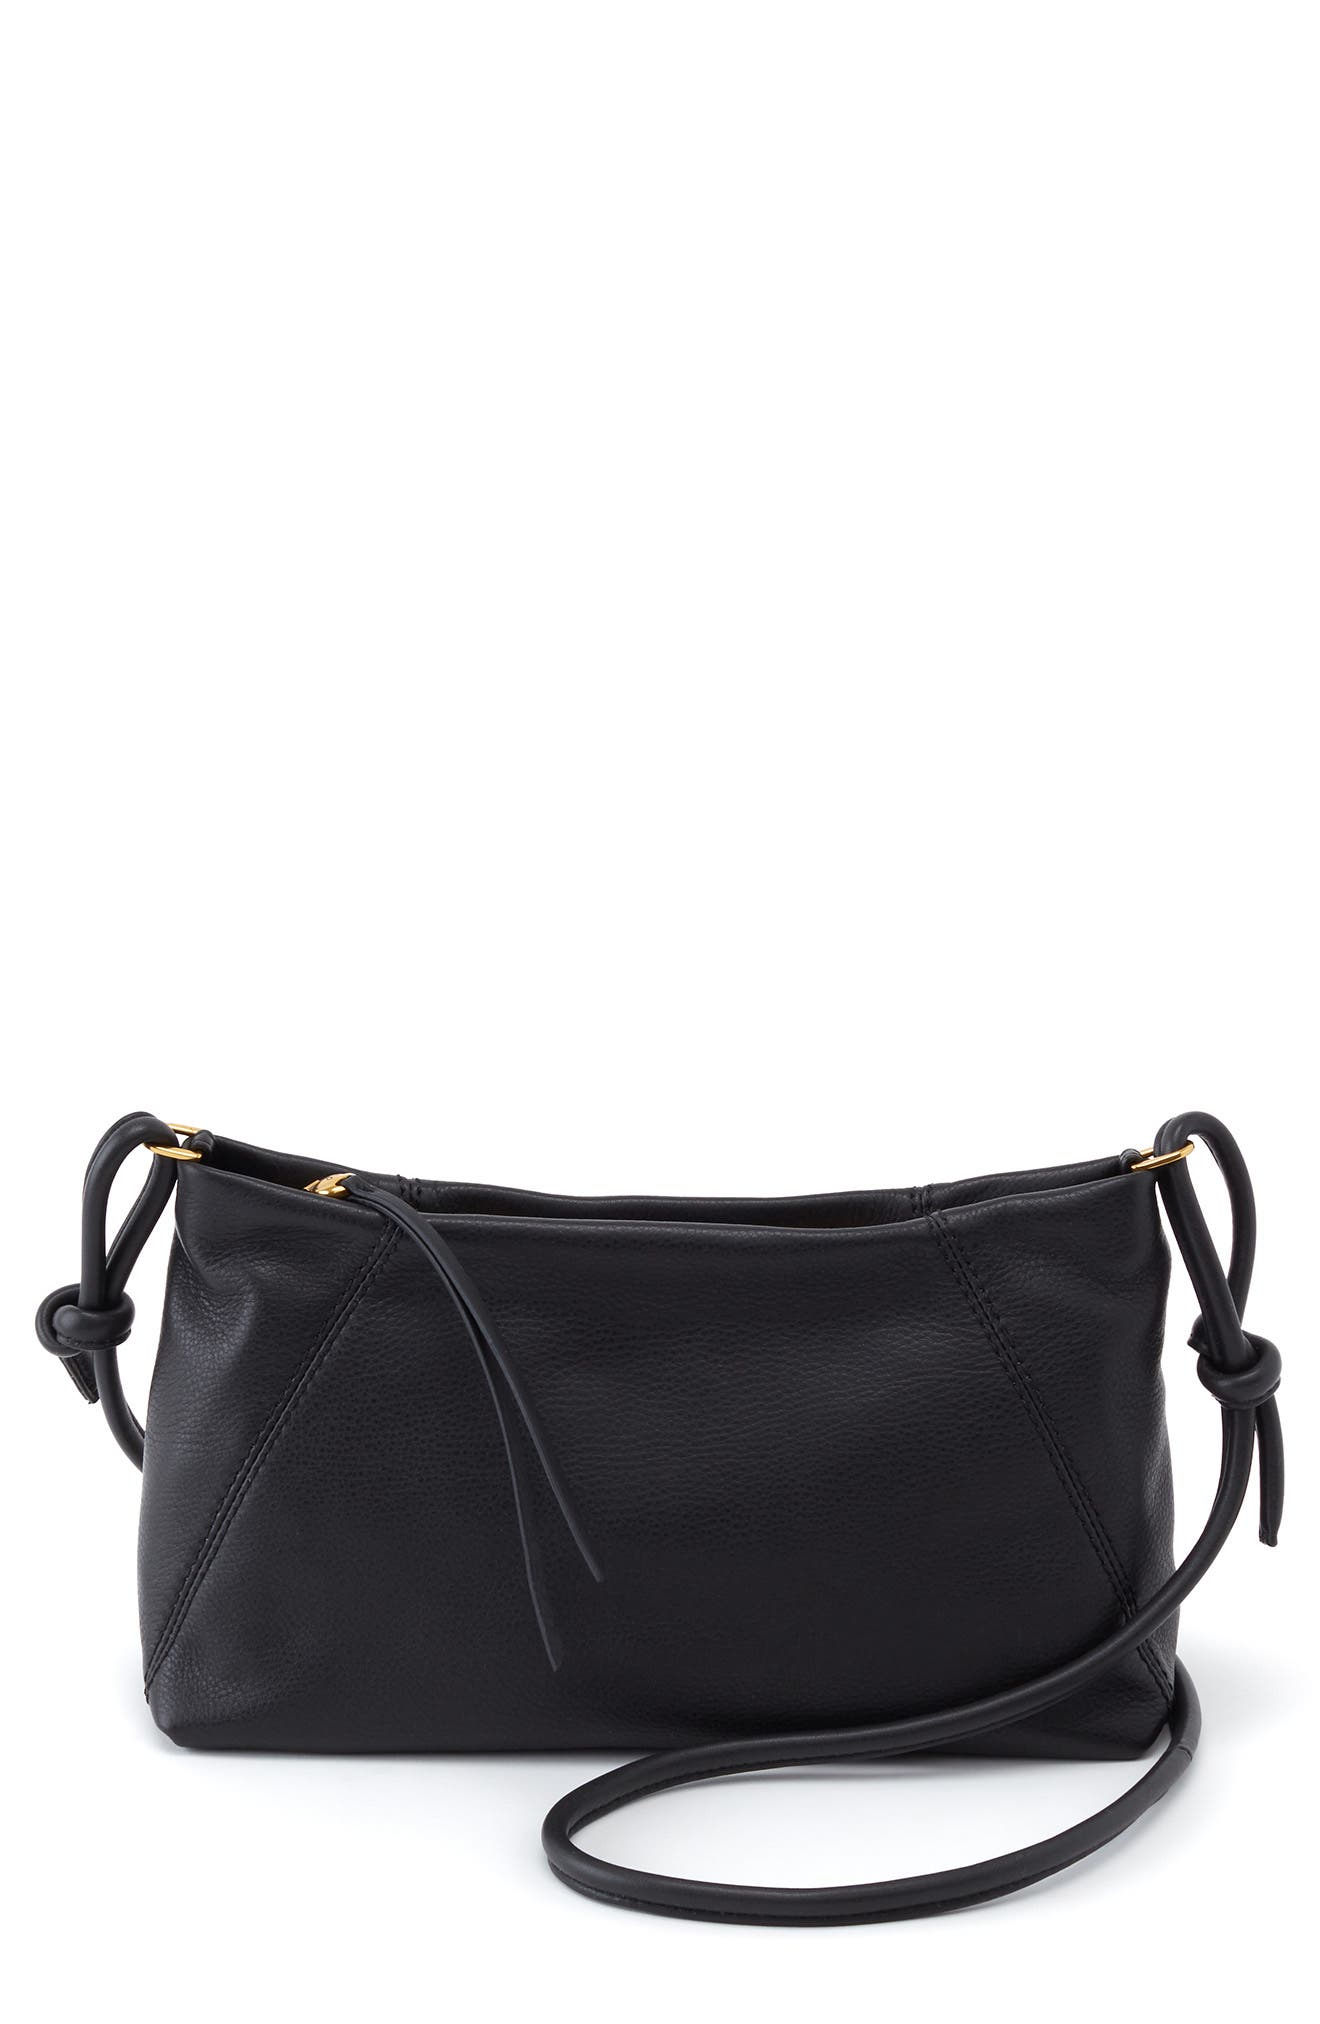 Vision Leather Crossbody Bag